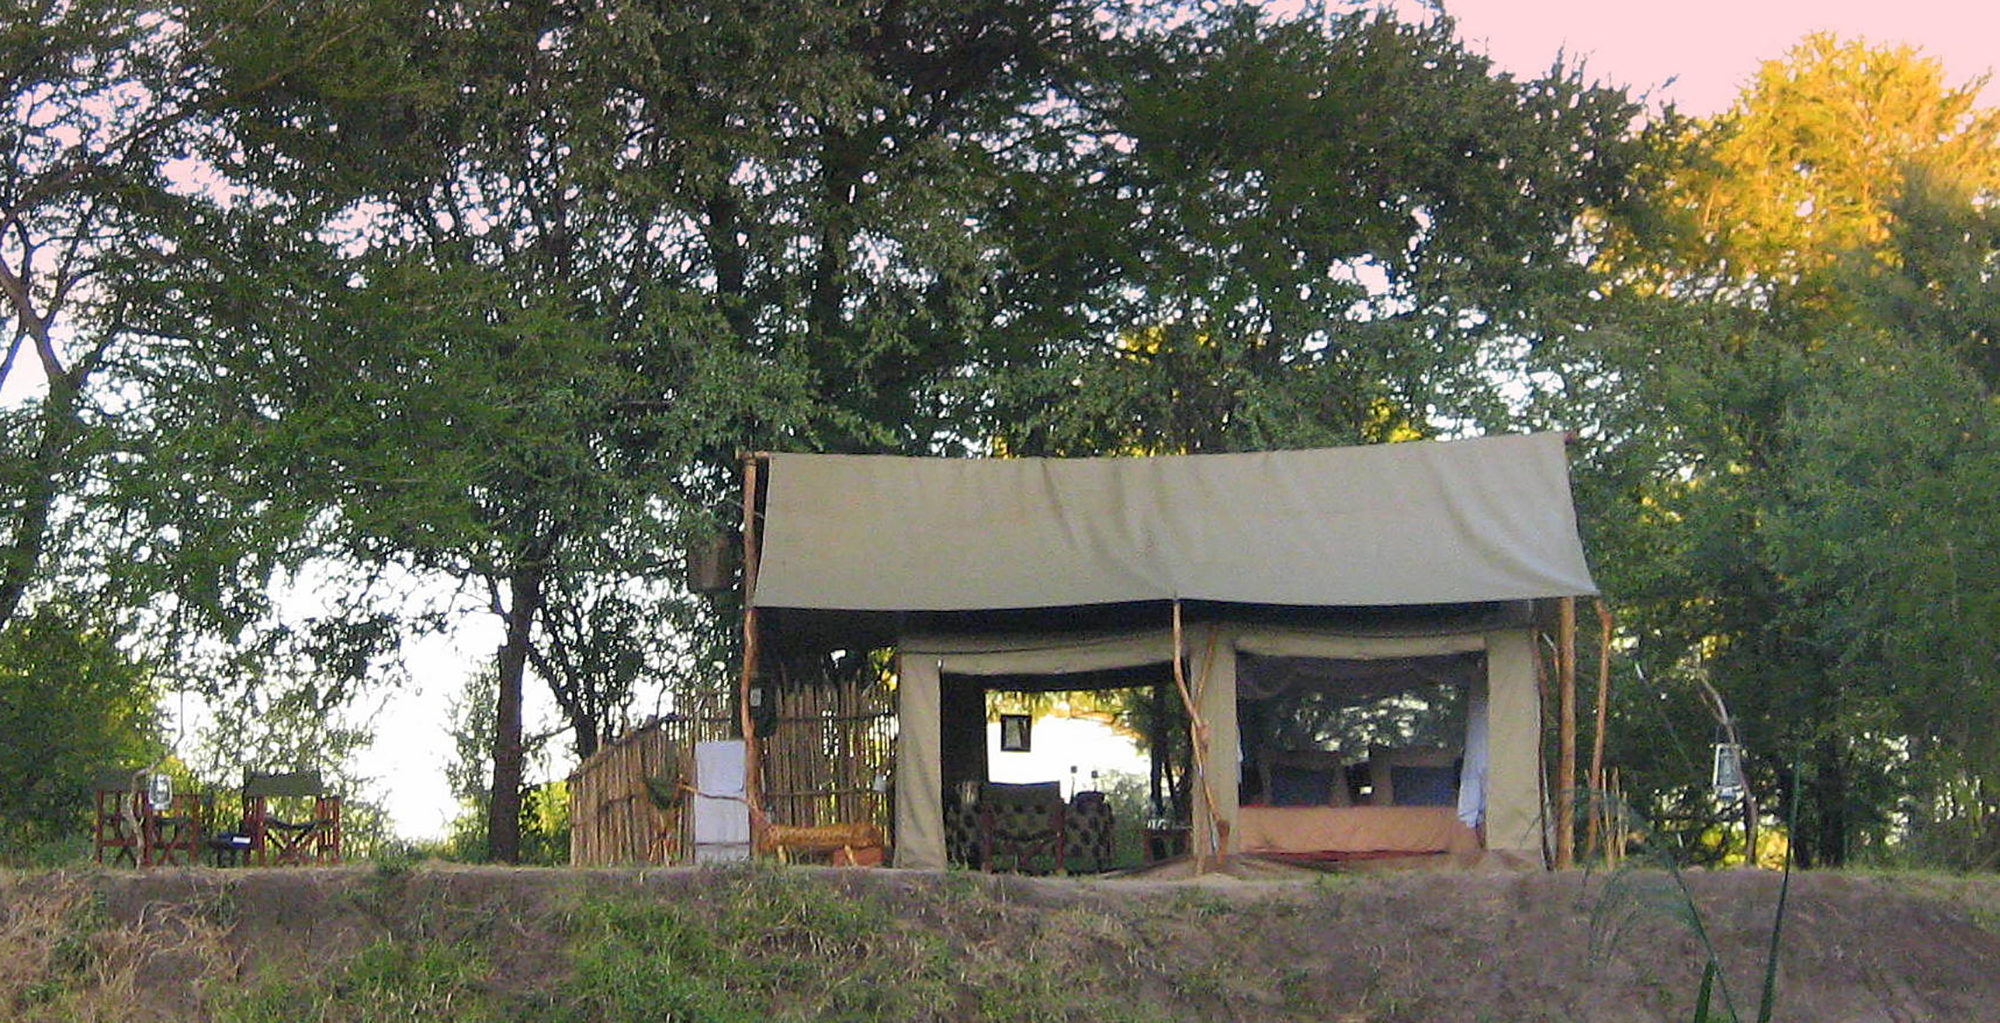 Mozambique-Gorongosa-National-Park-Explora-Gorongosa-Exterior